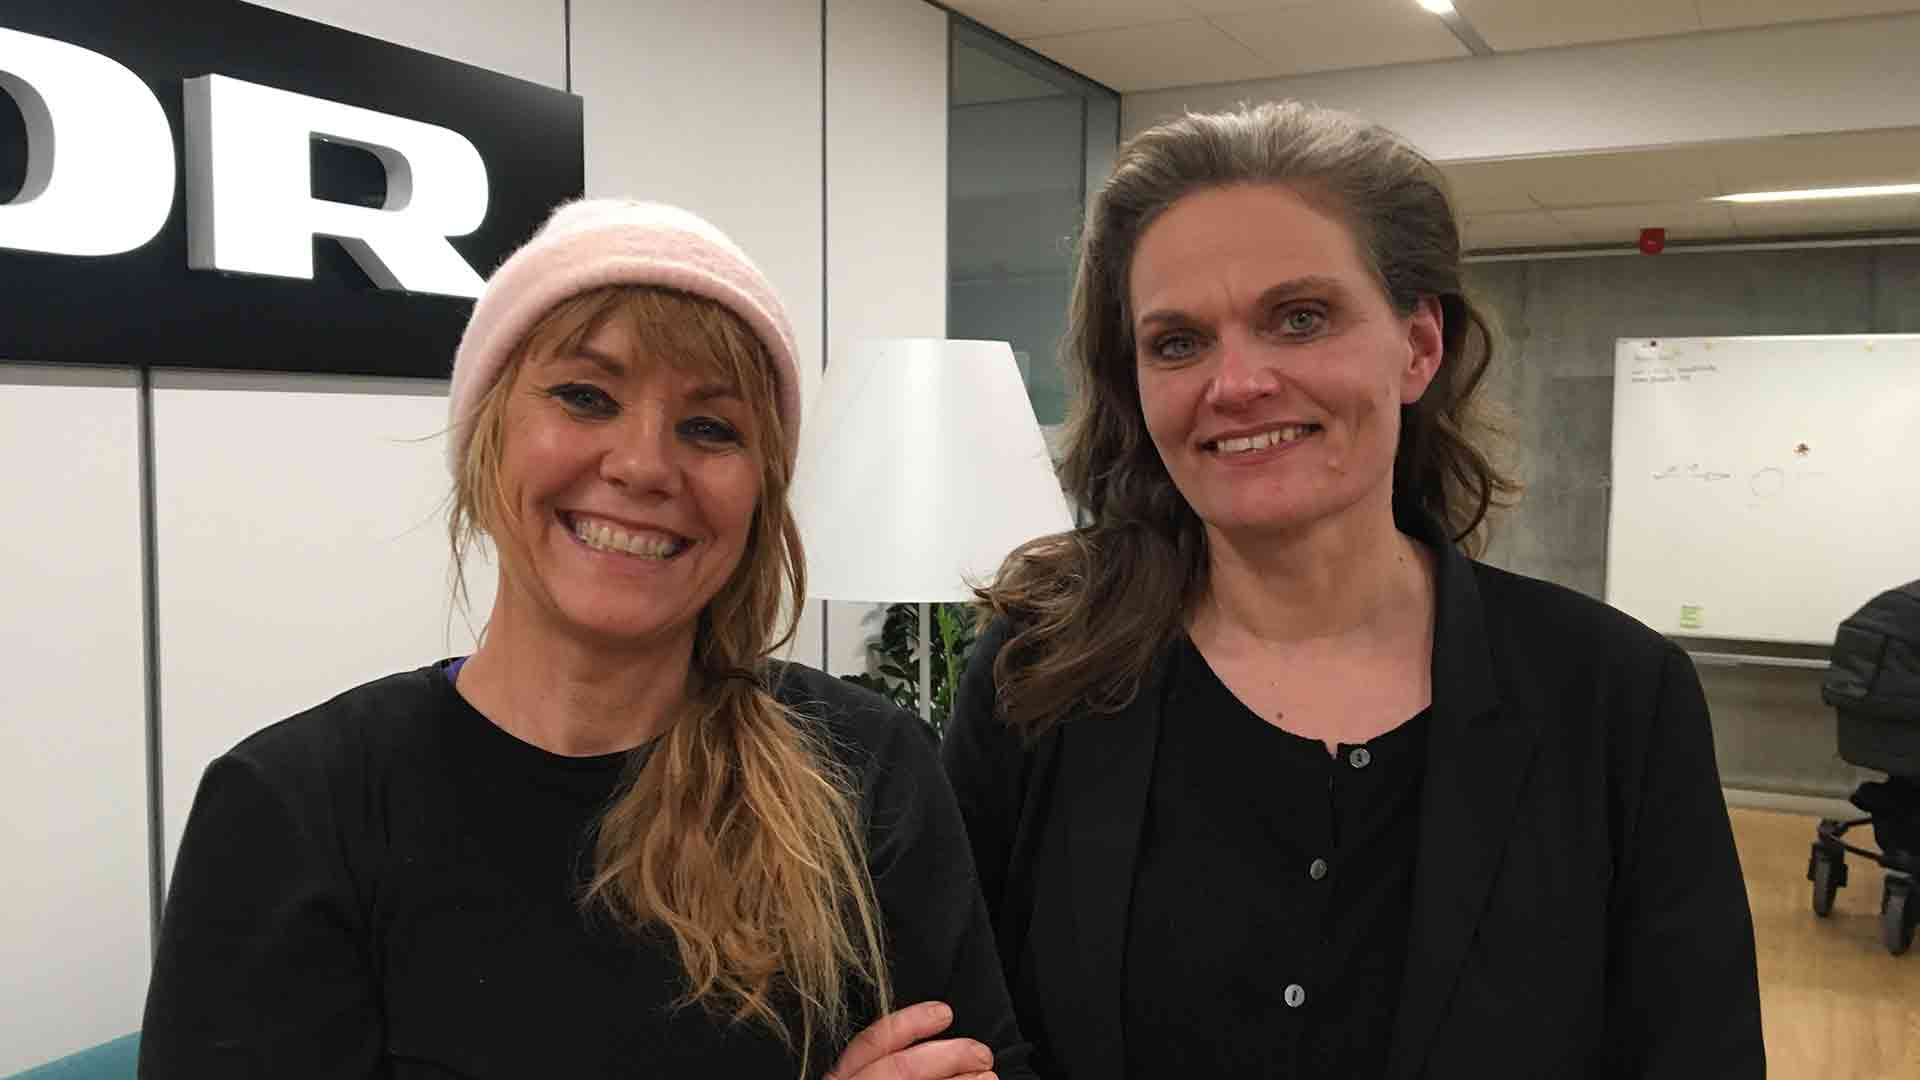 Ping Pong - med Line Knutzon og Sørine Godtfredsen